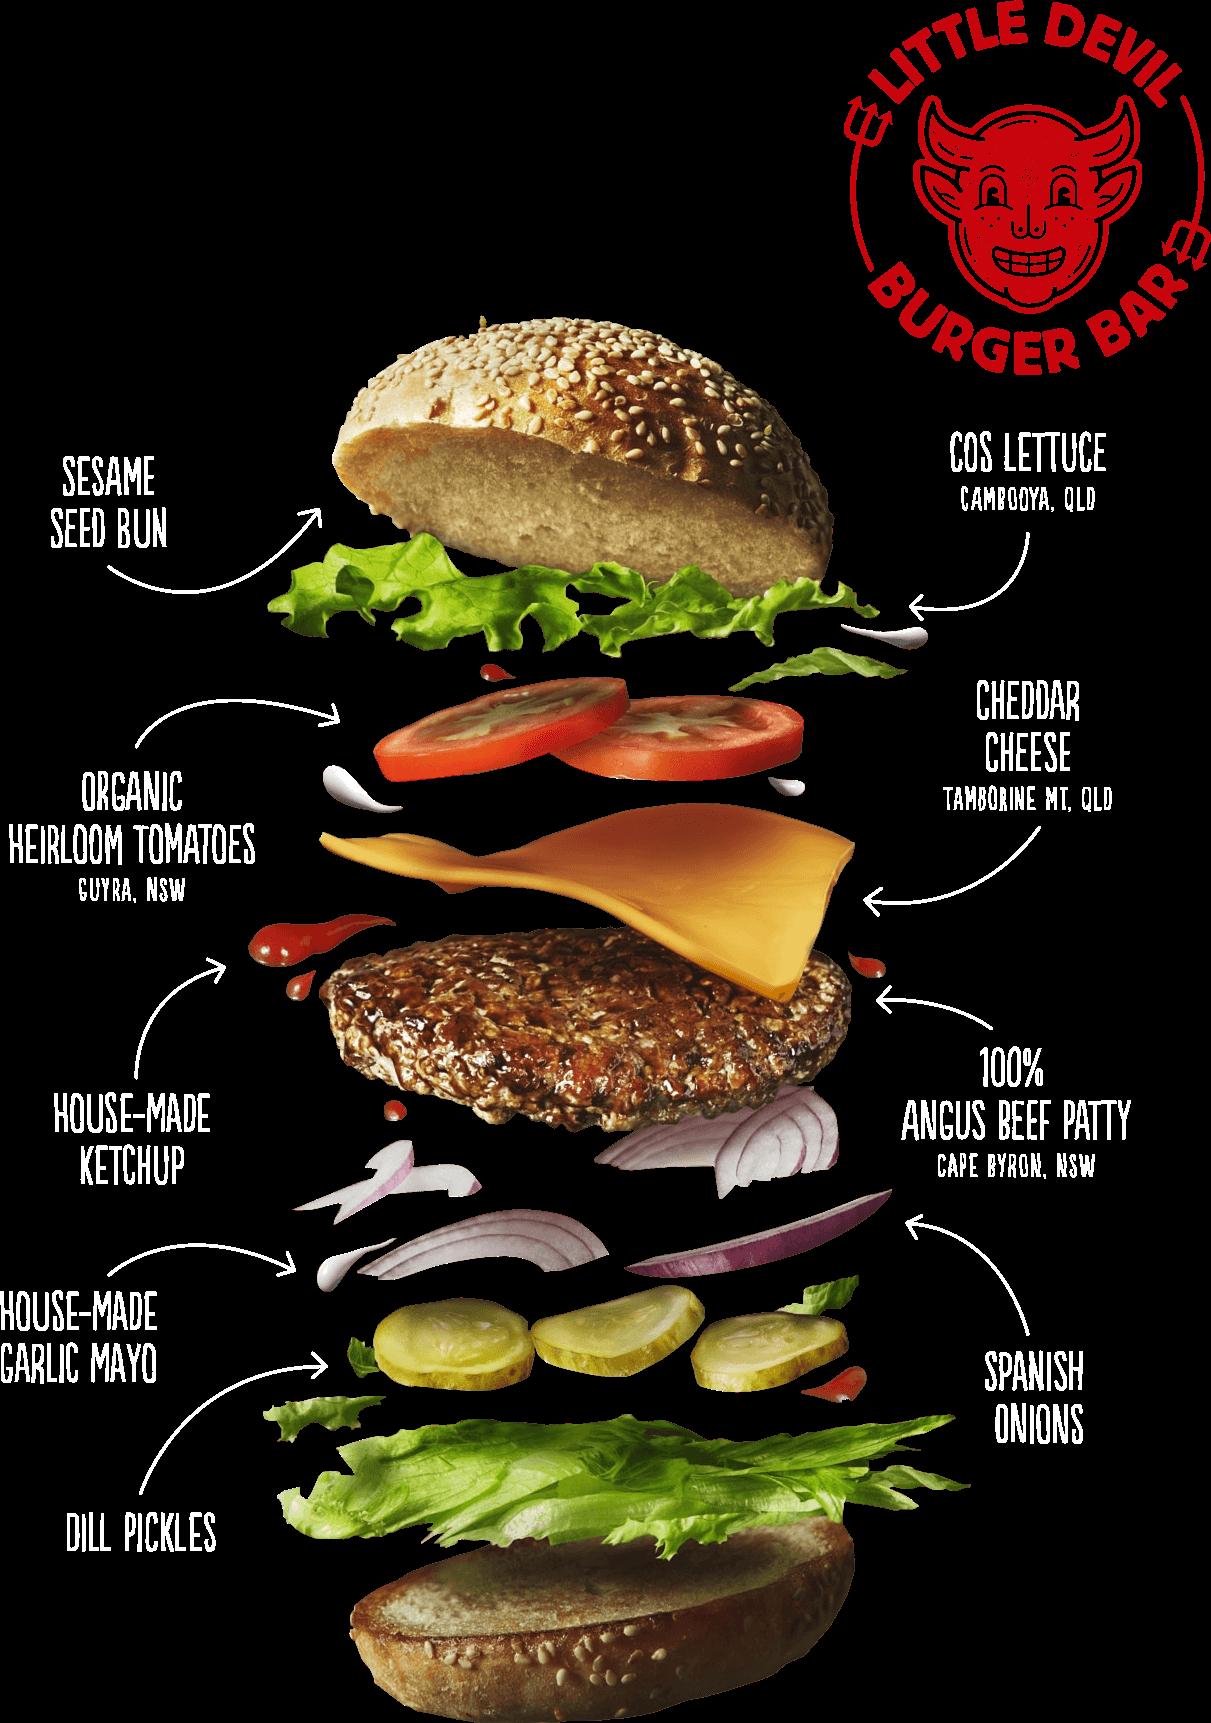 Little devil damian dlugolecki. Hamburger clipart burger bar